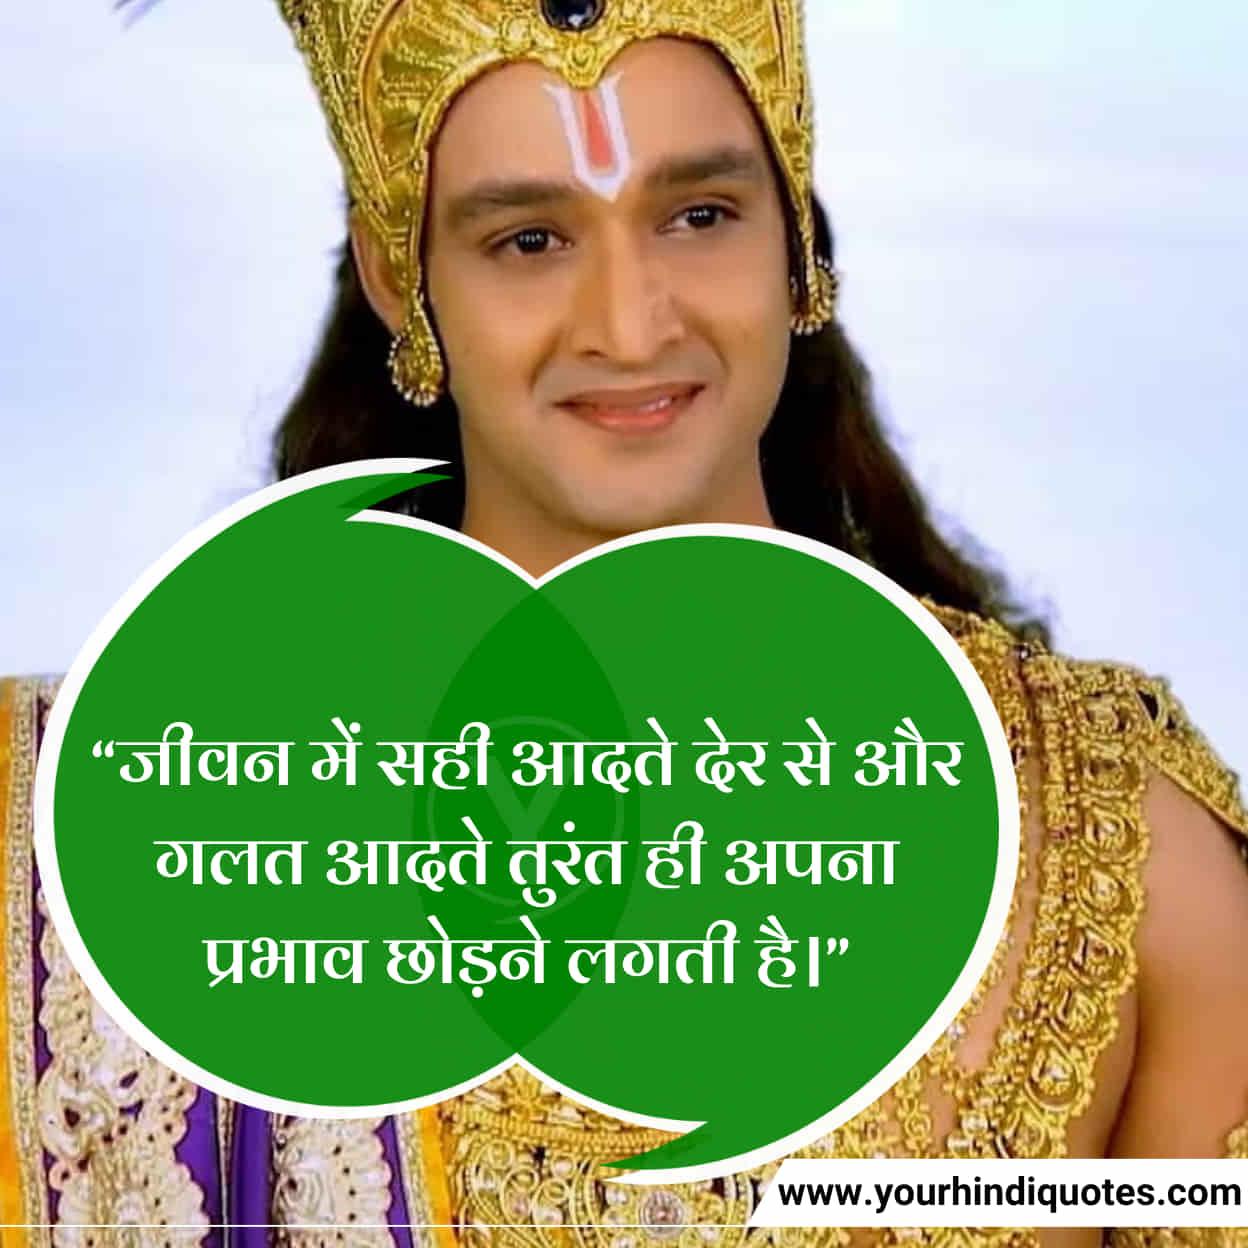 Bhagwat Gita Motivational Hindi Quotes